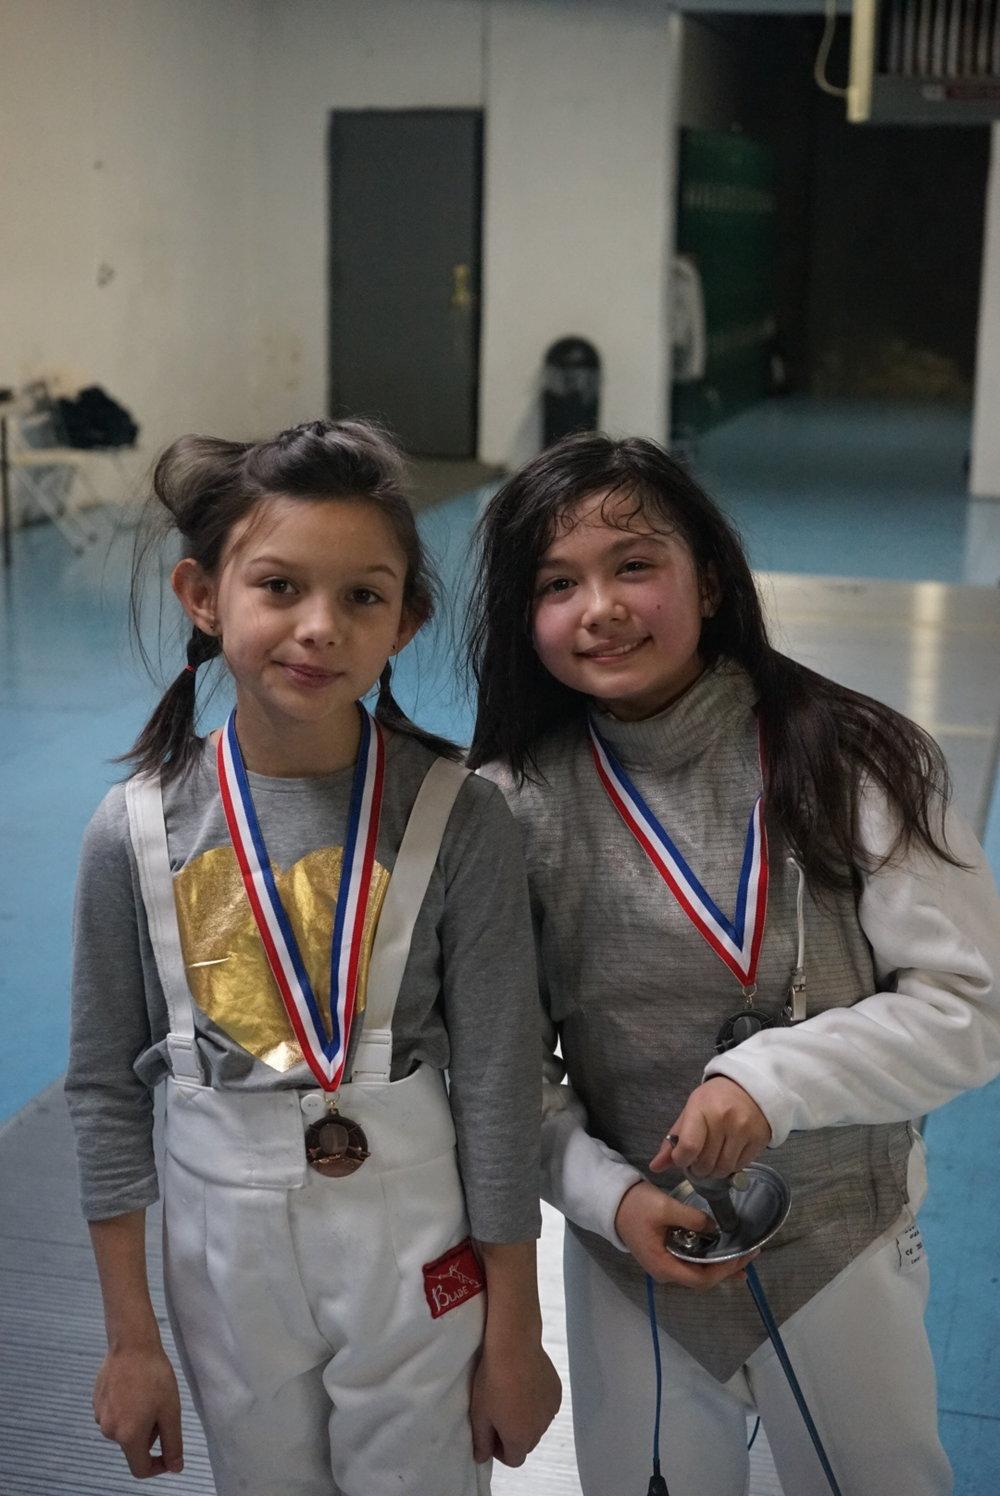 BROOKLYN YOUTH Y10 Sabine Sarefield 3rd place  March 6th 2016